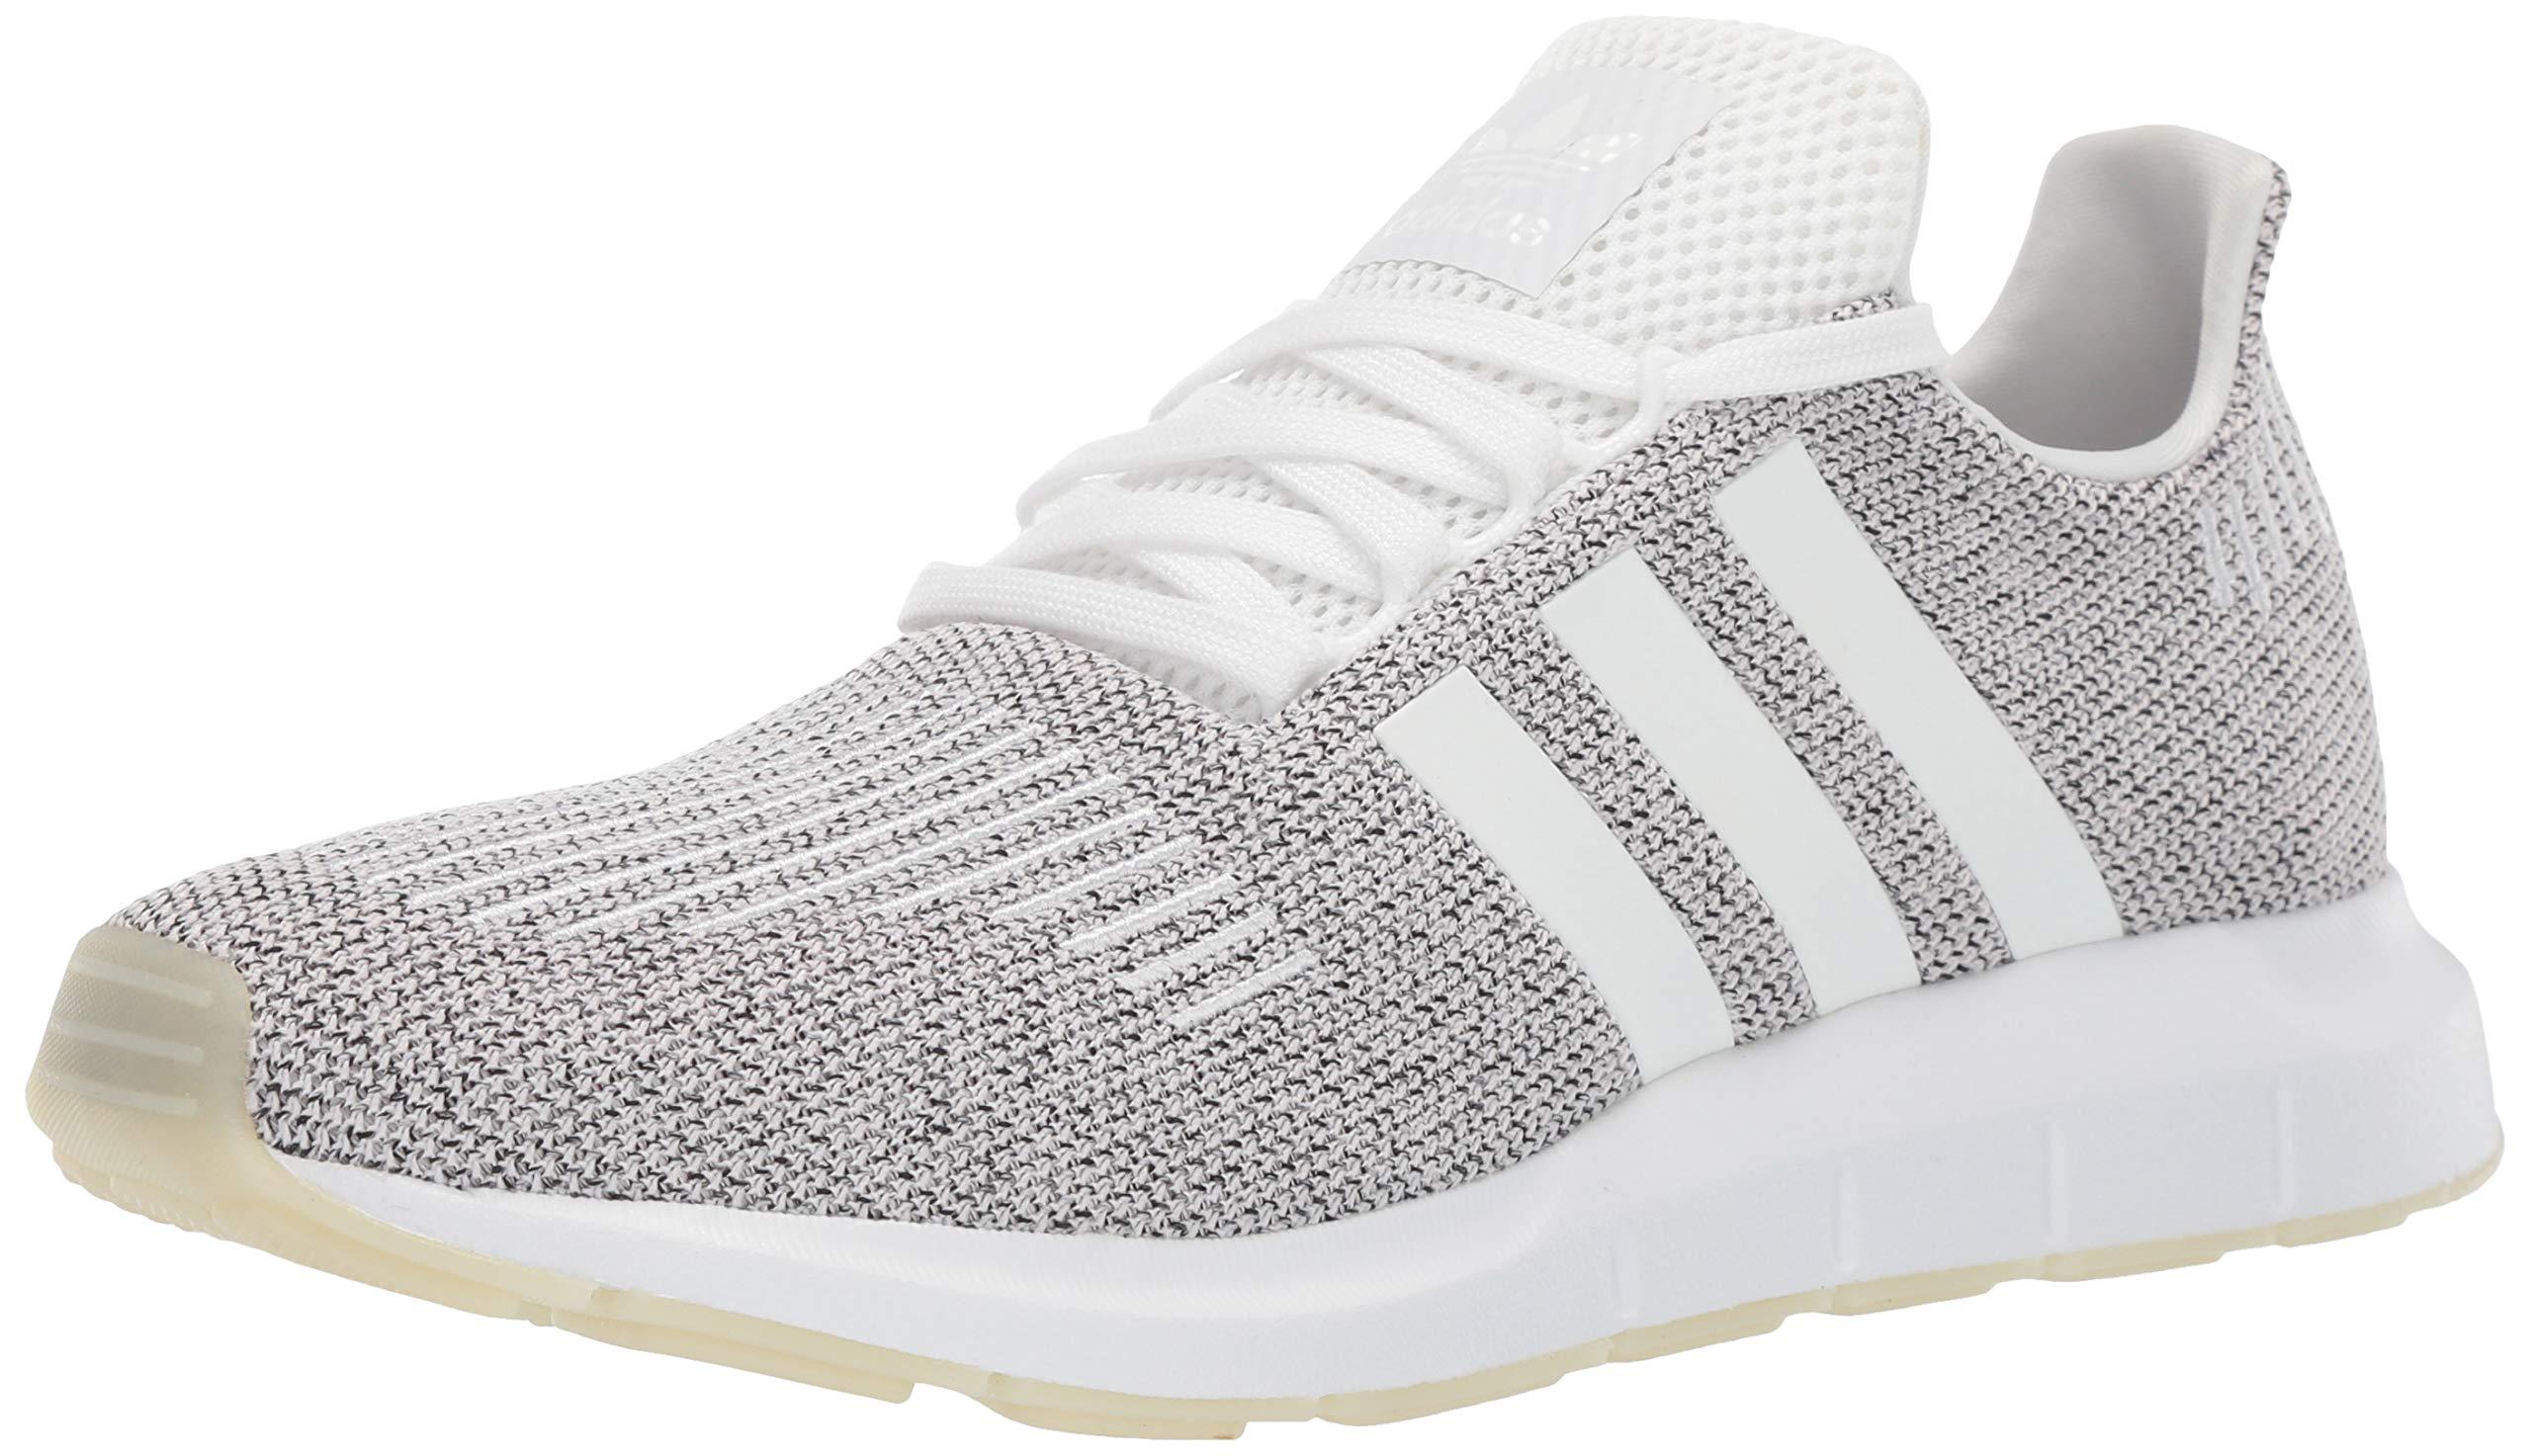 adidas Originals Men's Swift Running Shoe, White/Black, 4.5 M US